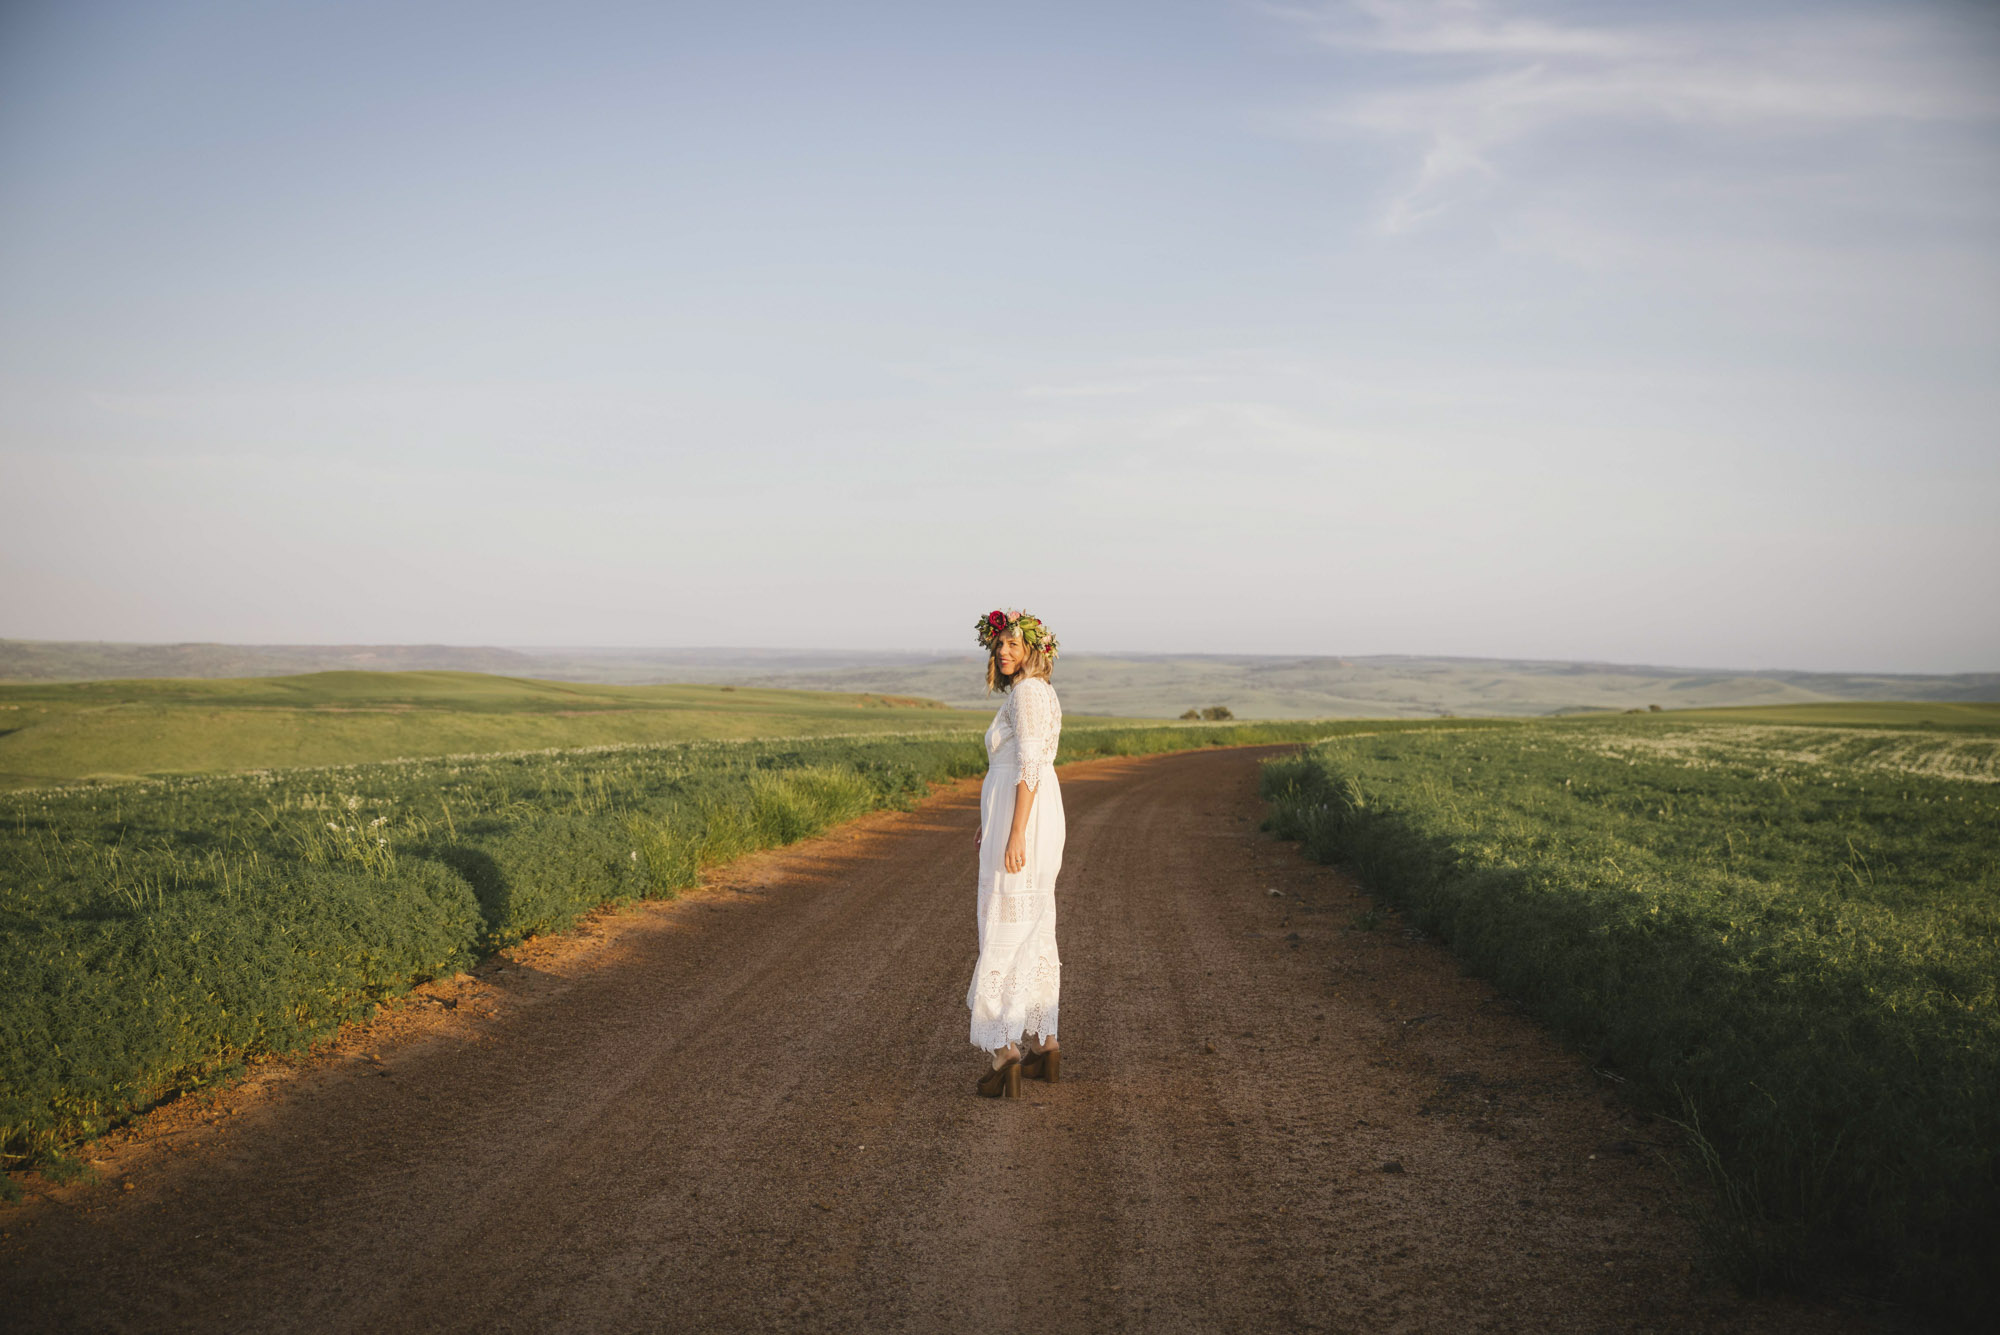 Angie-Roe-Photography-Wedding-Perth-Northam-Wheatbelt-Country-Rural (116).jpg